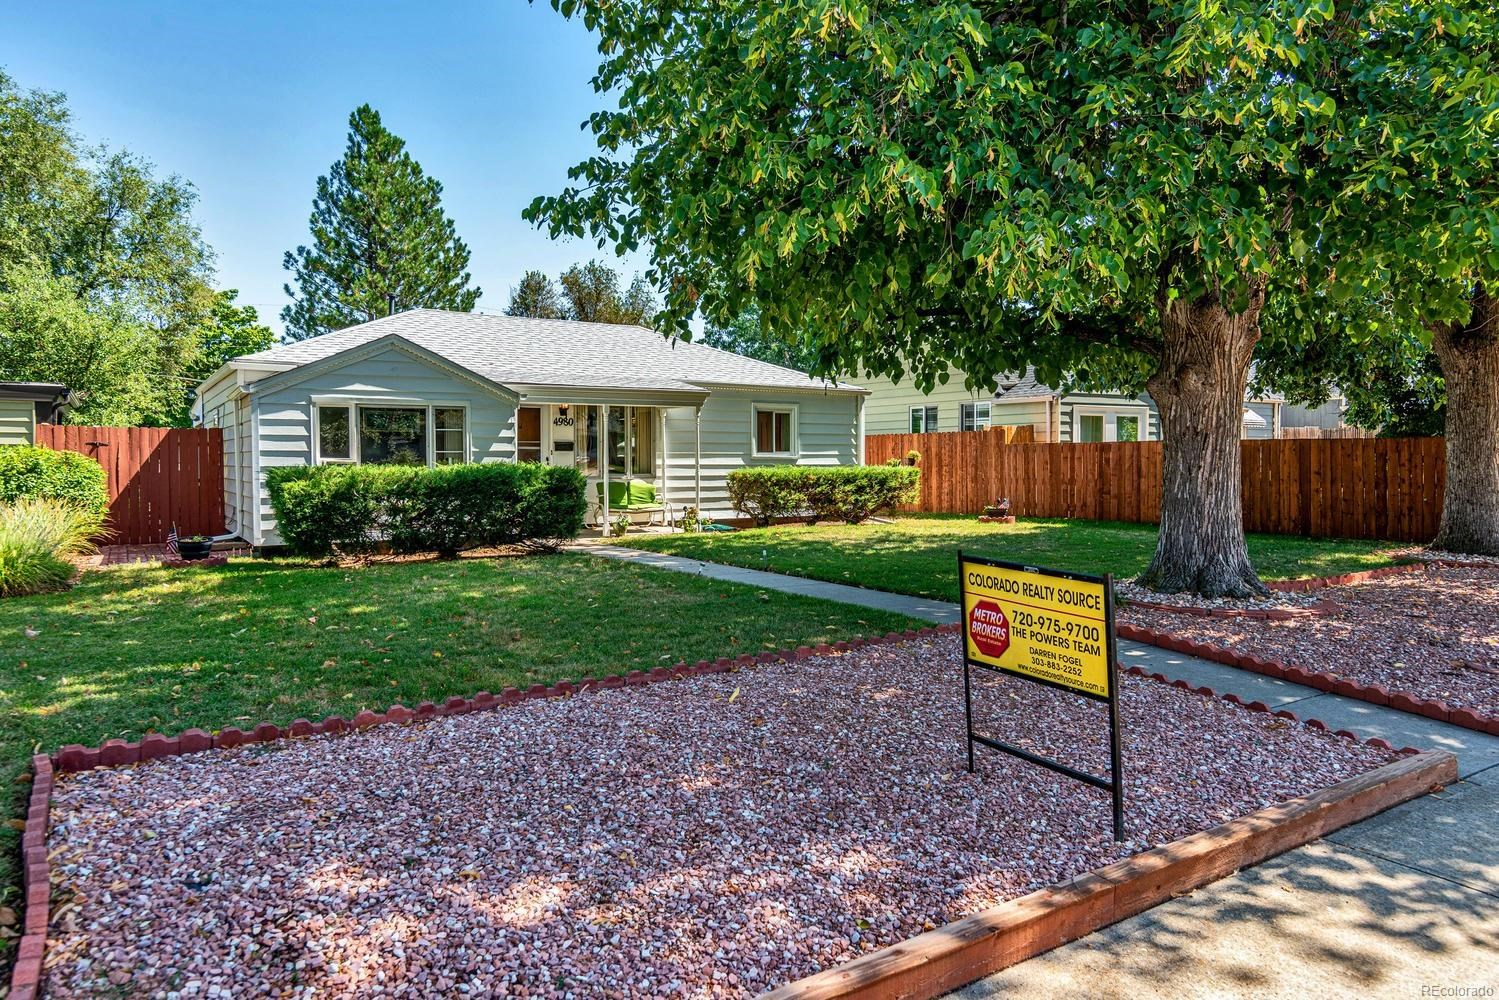 MLS# 4861585 - 1 - 4980 Clay Street, Denver, CO 80221